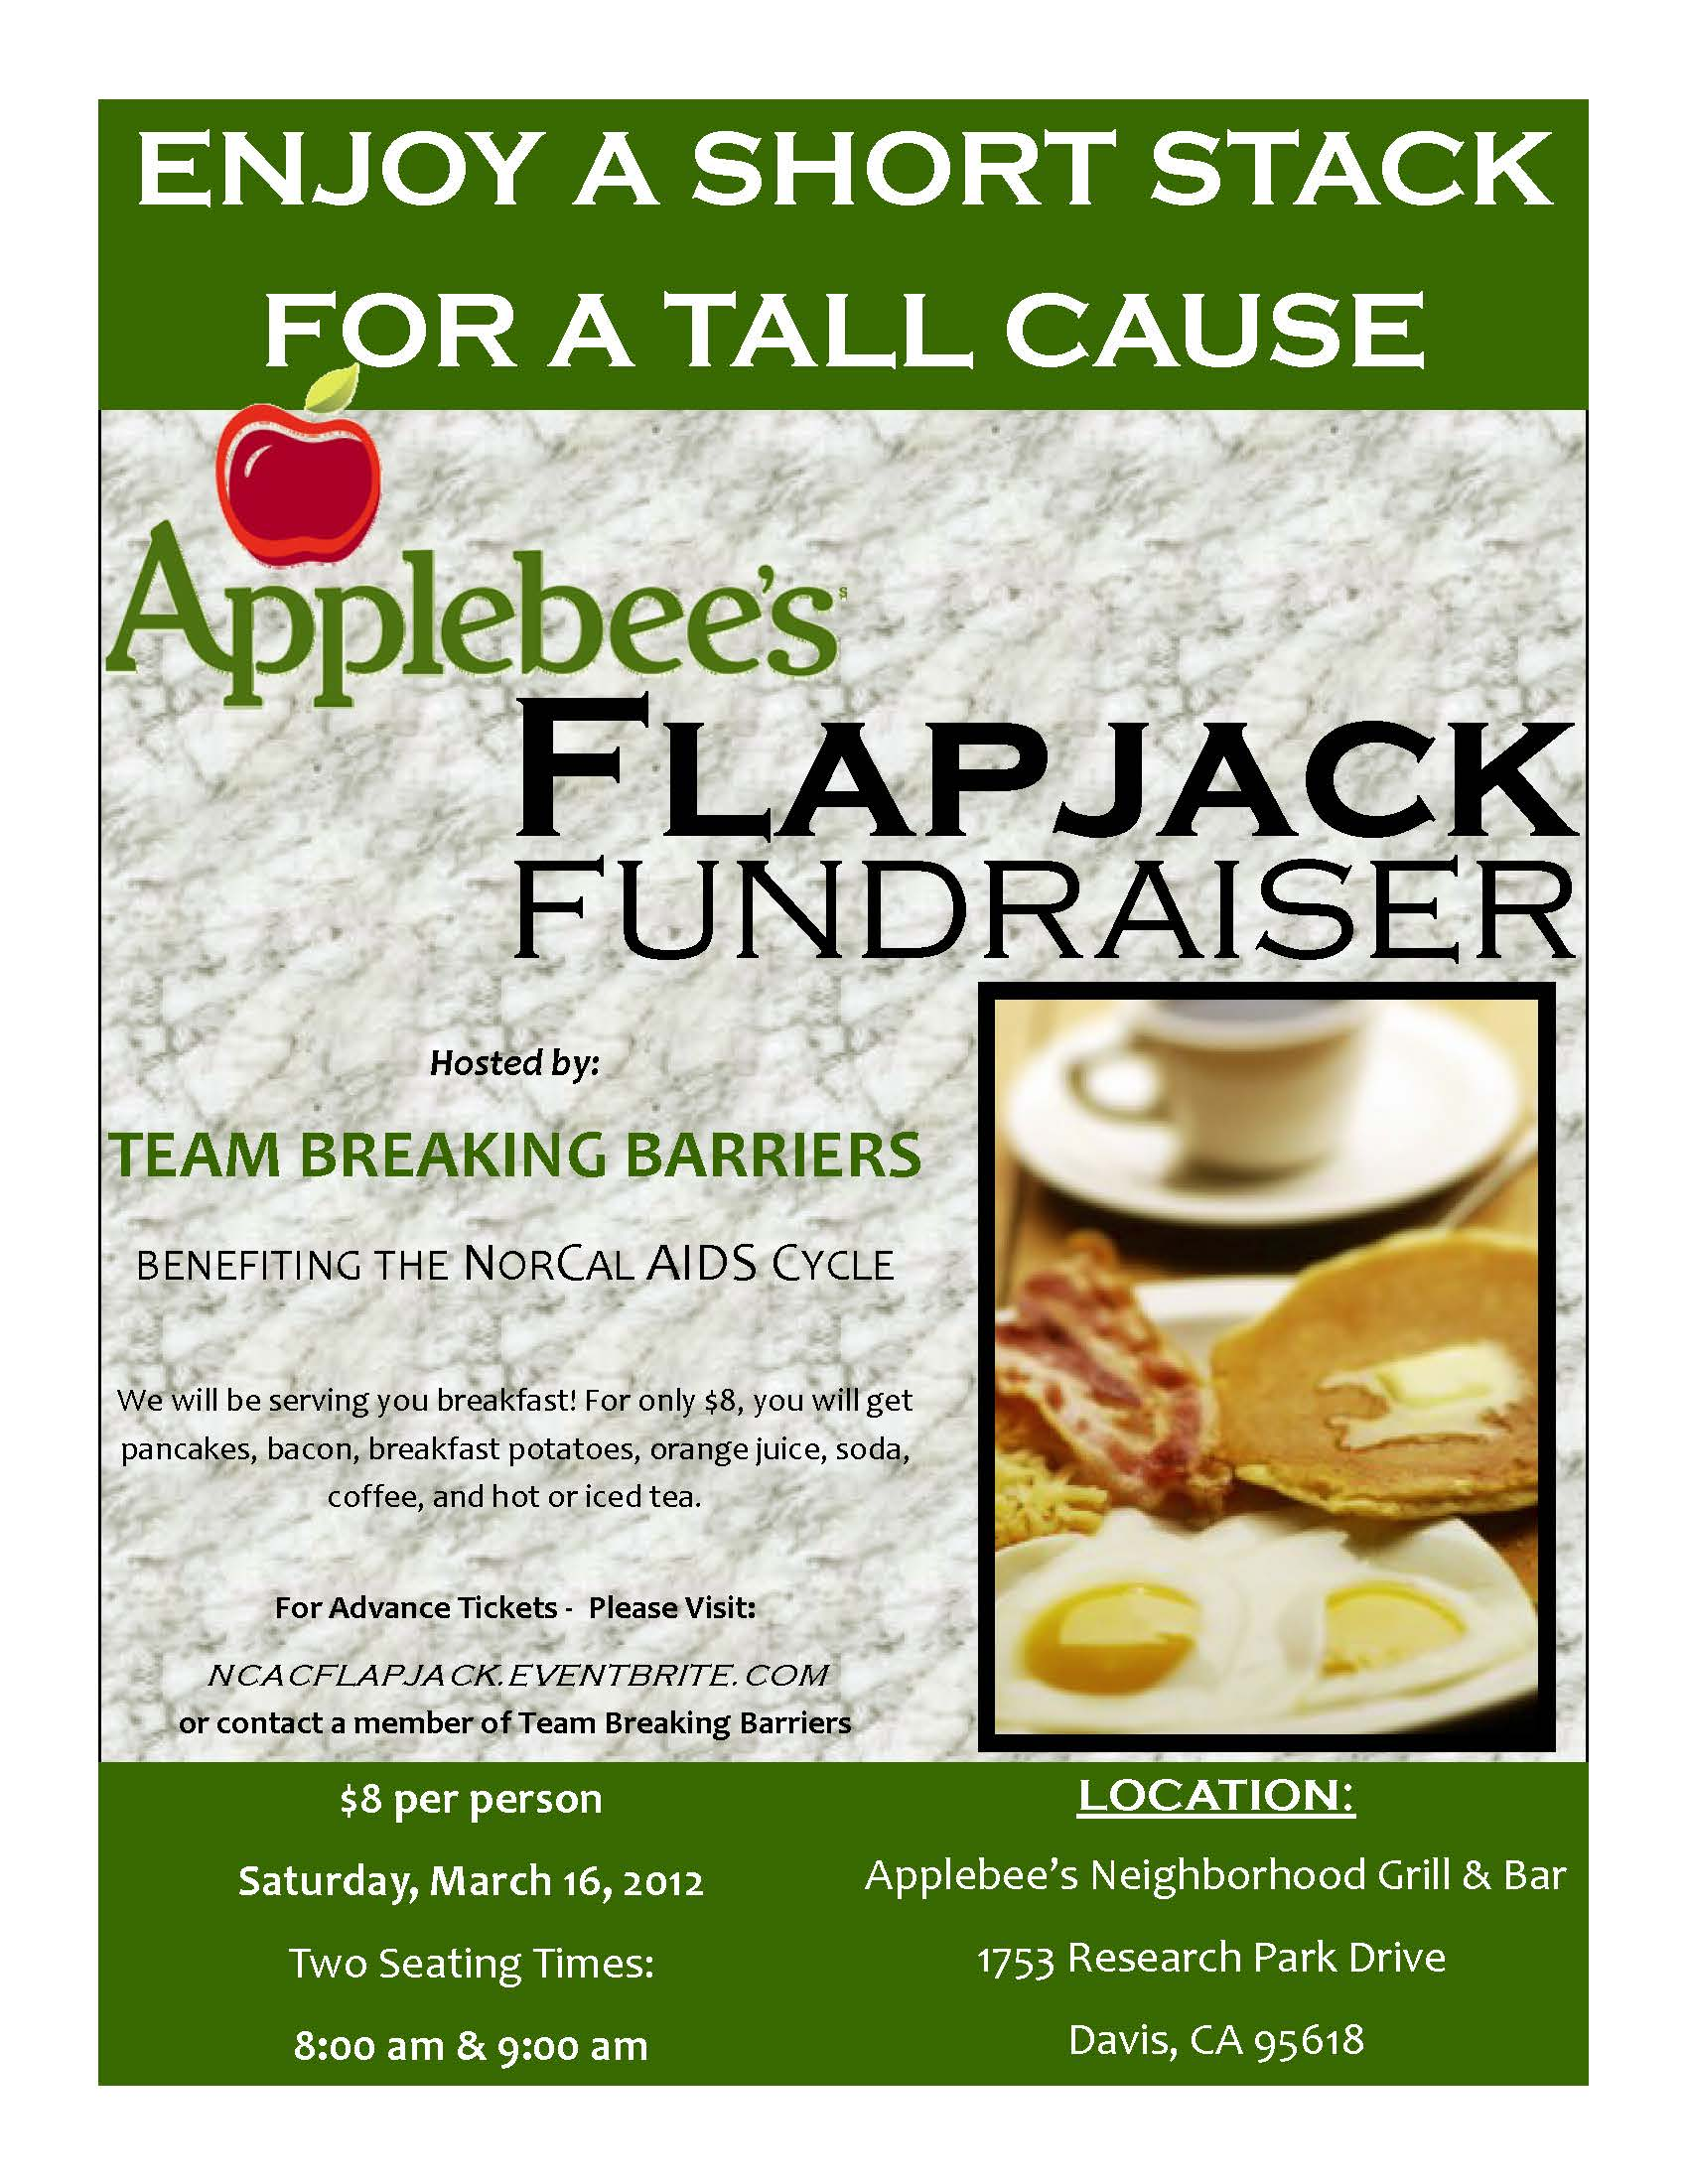 applebee's flapjack fundraiser flyer template .